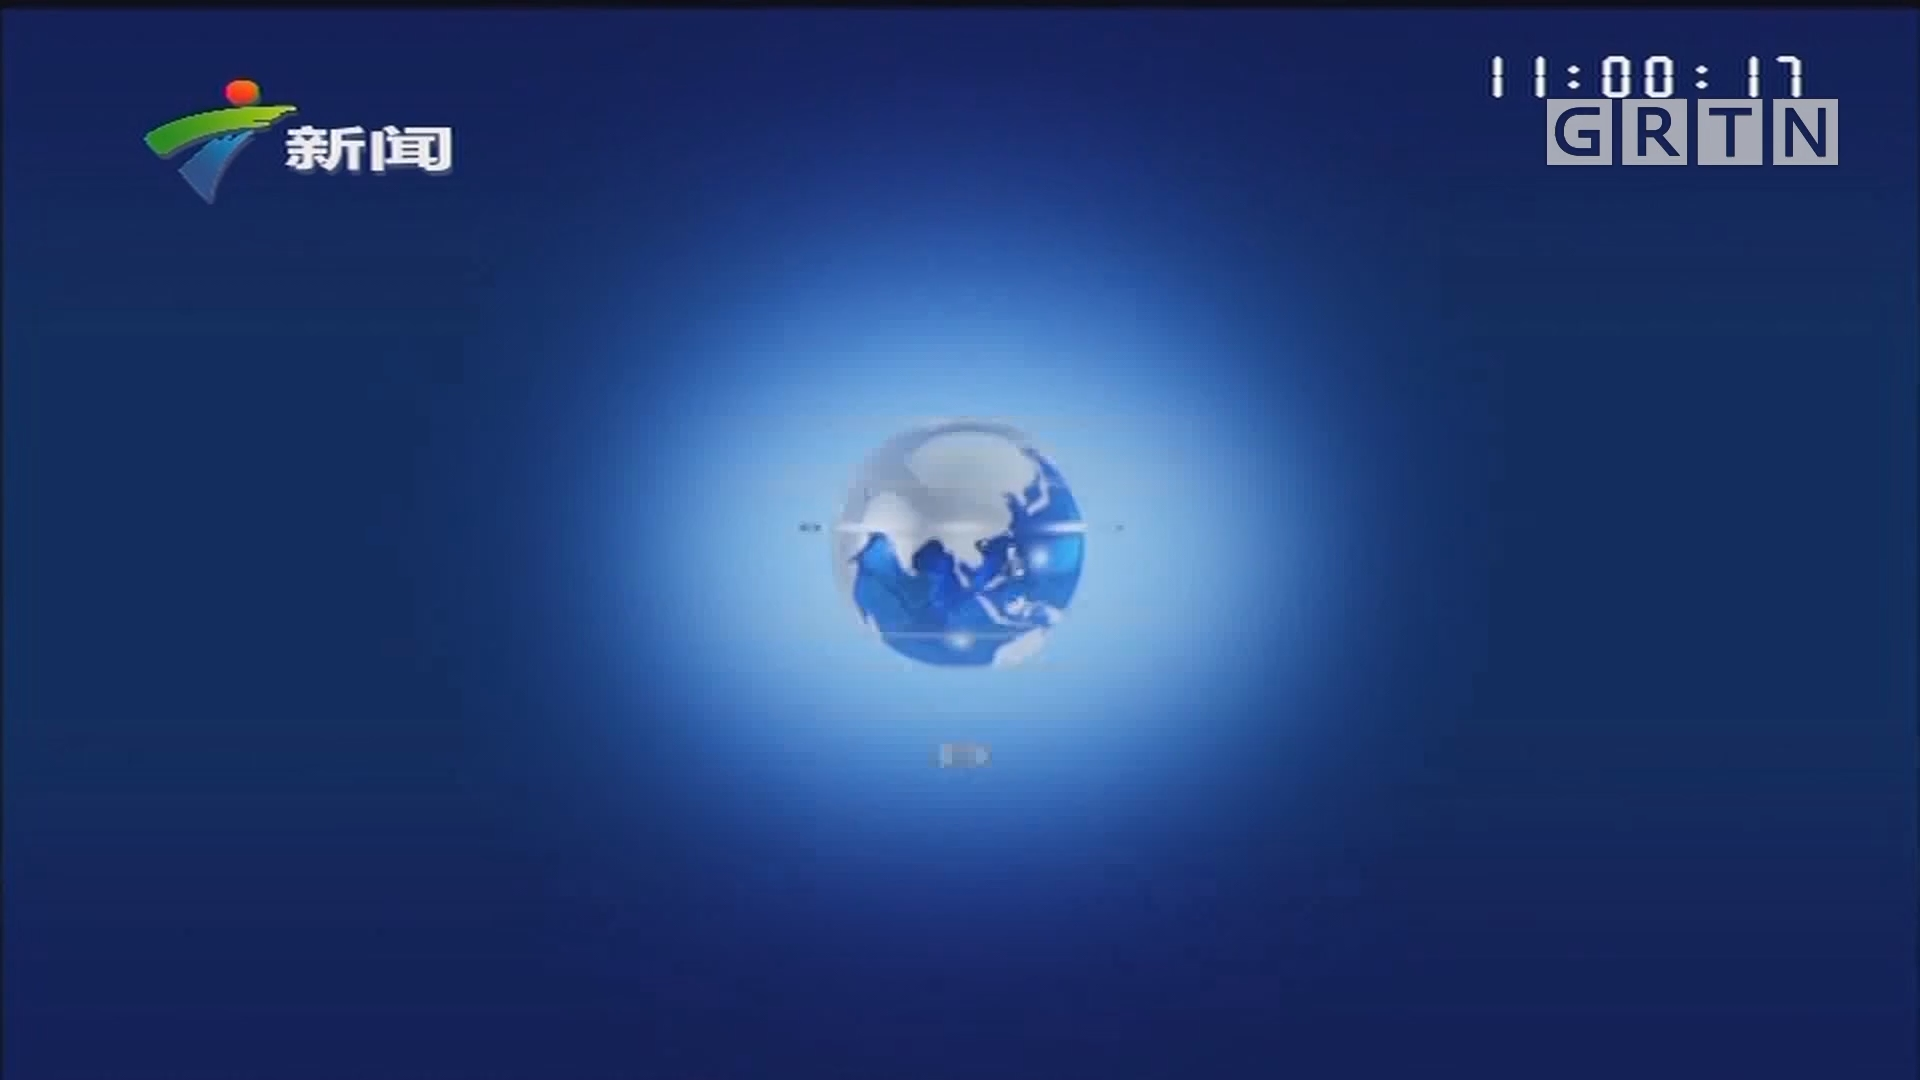 [HD][2019-10-31]正点播报:税务总局:前三季度个人所得税人均减税1764元